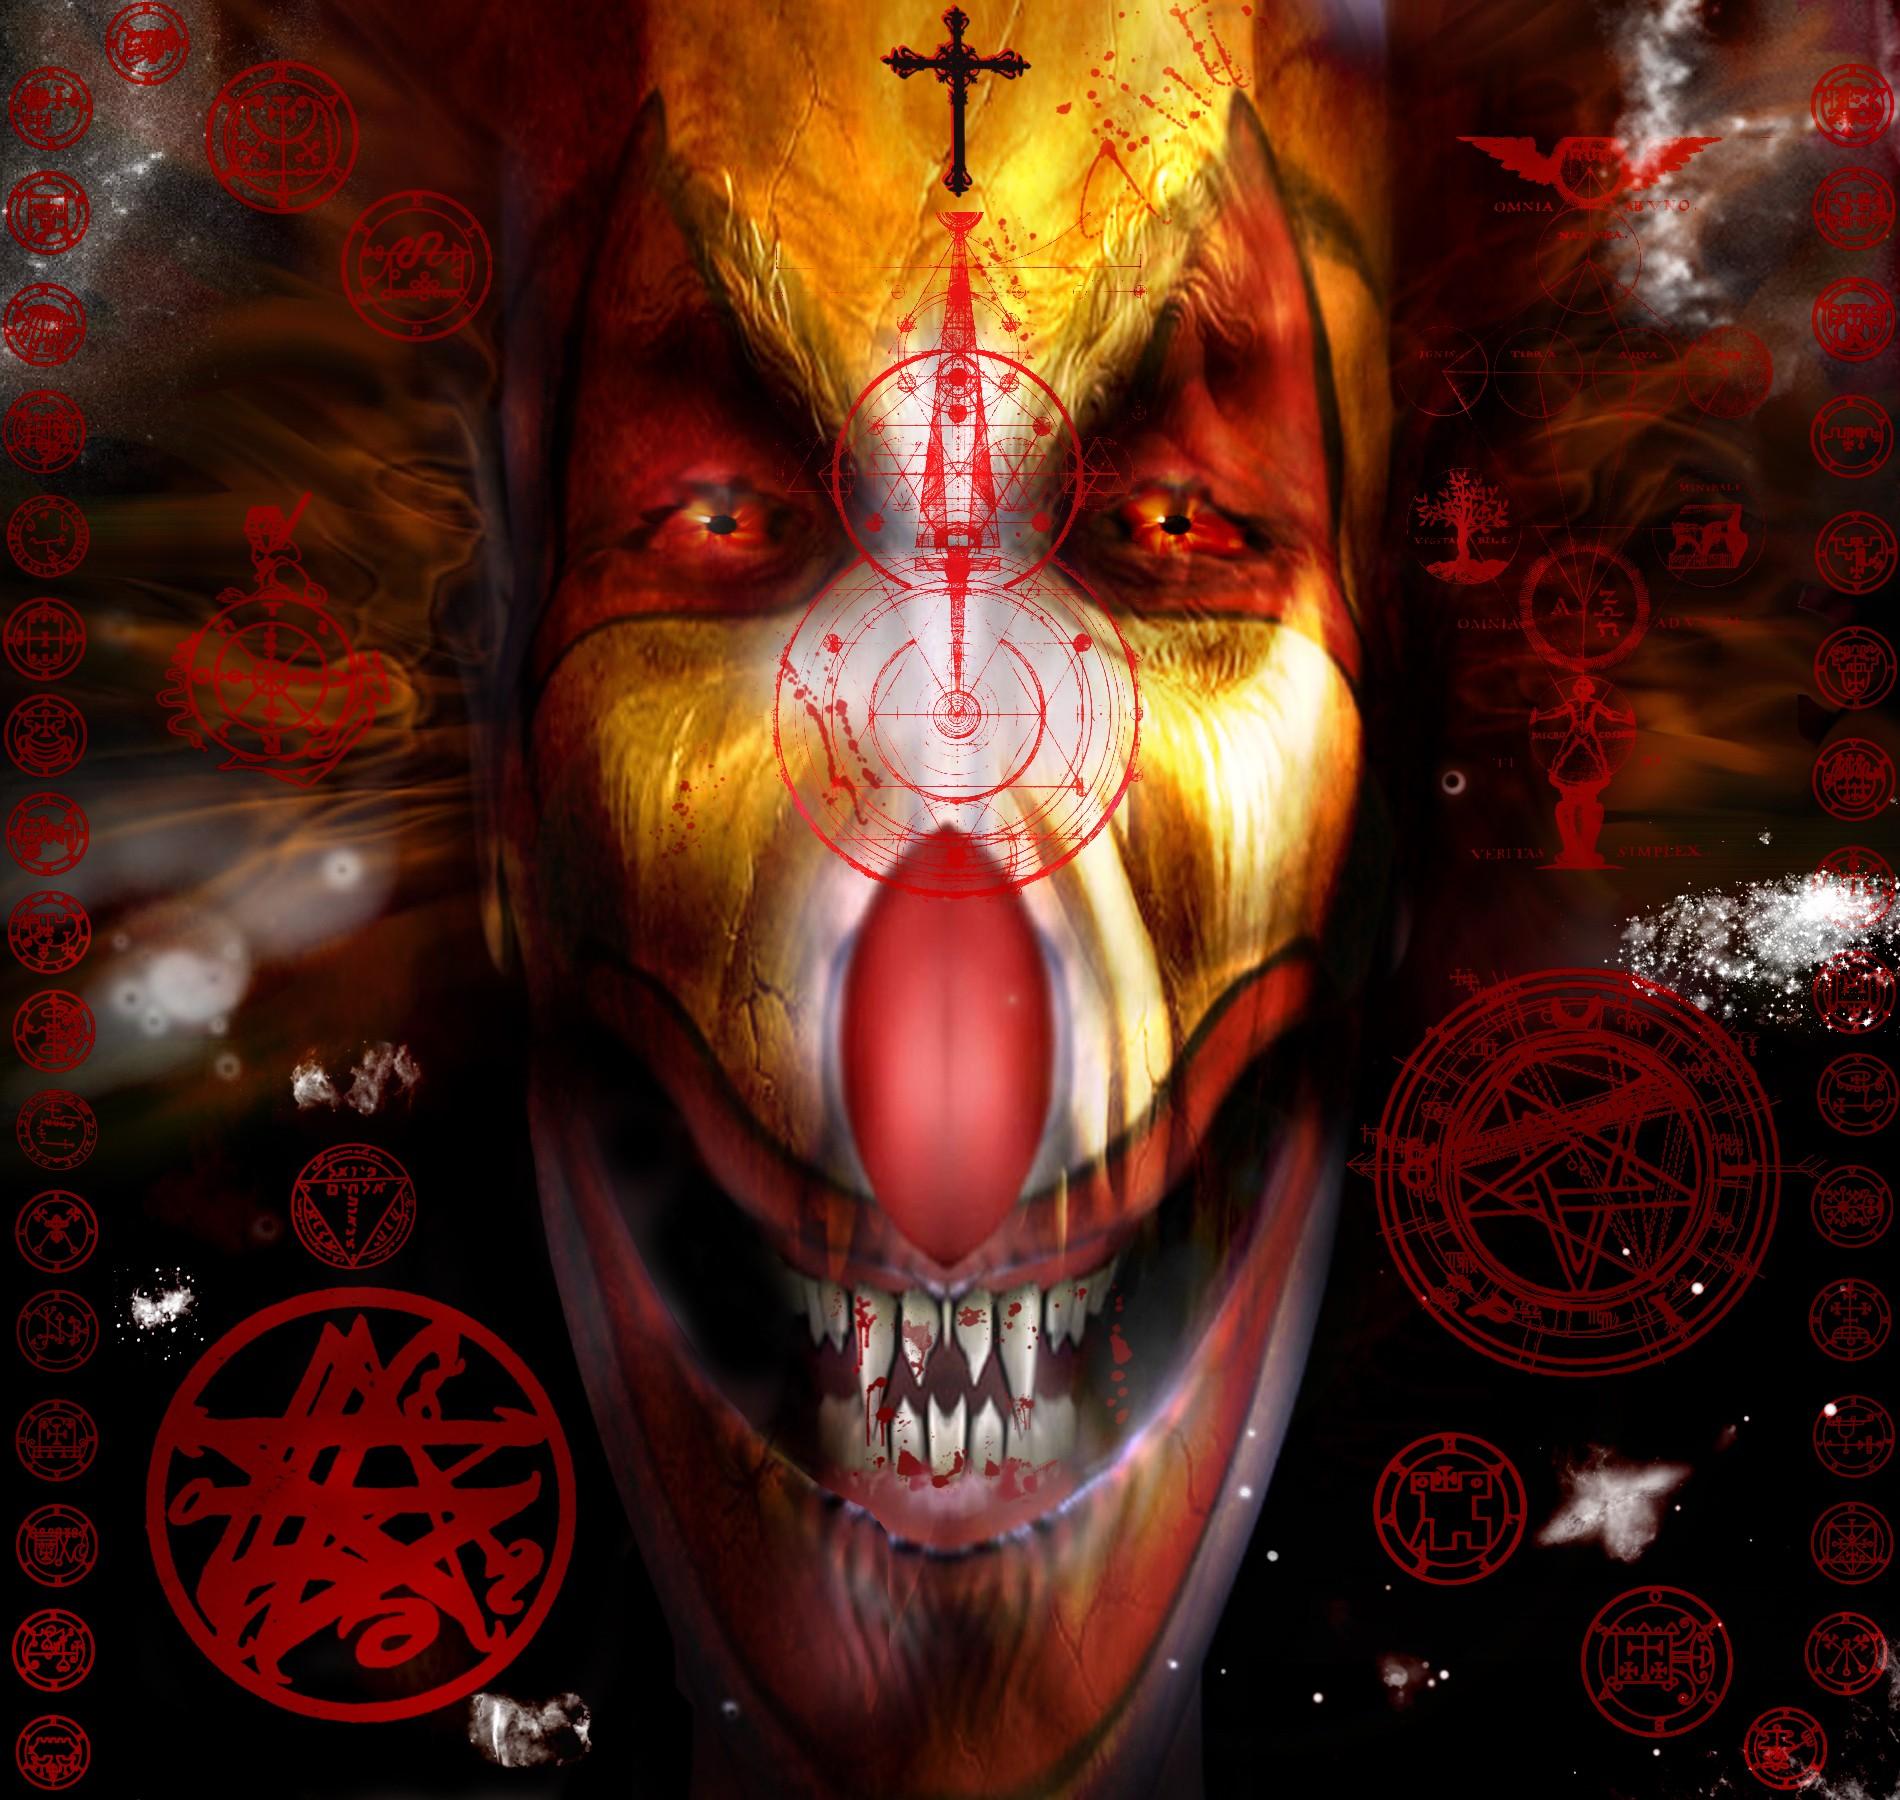 Hd wallpaper evil - Scary Clowns Wallpaper Scary Clown Hd Wallpapers